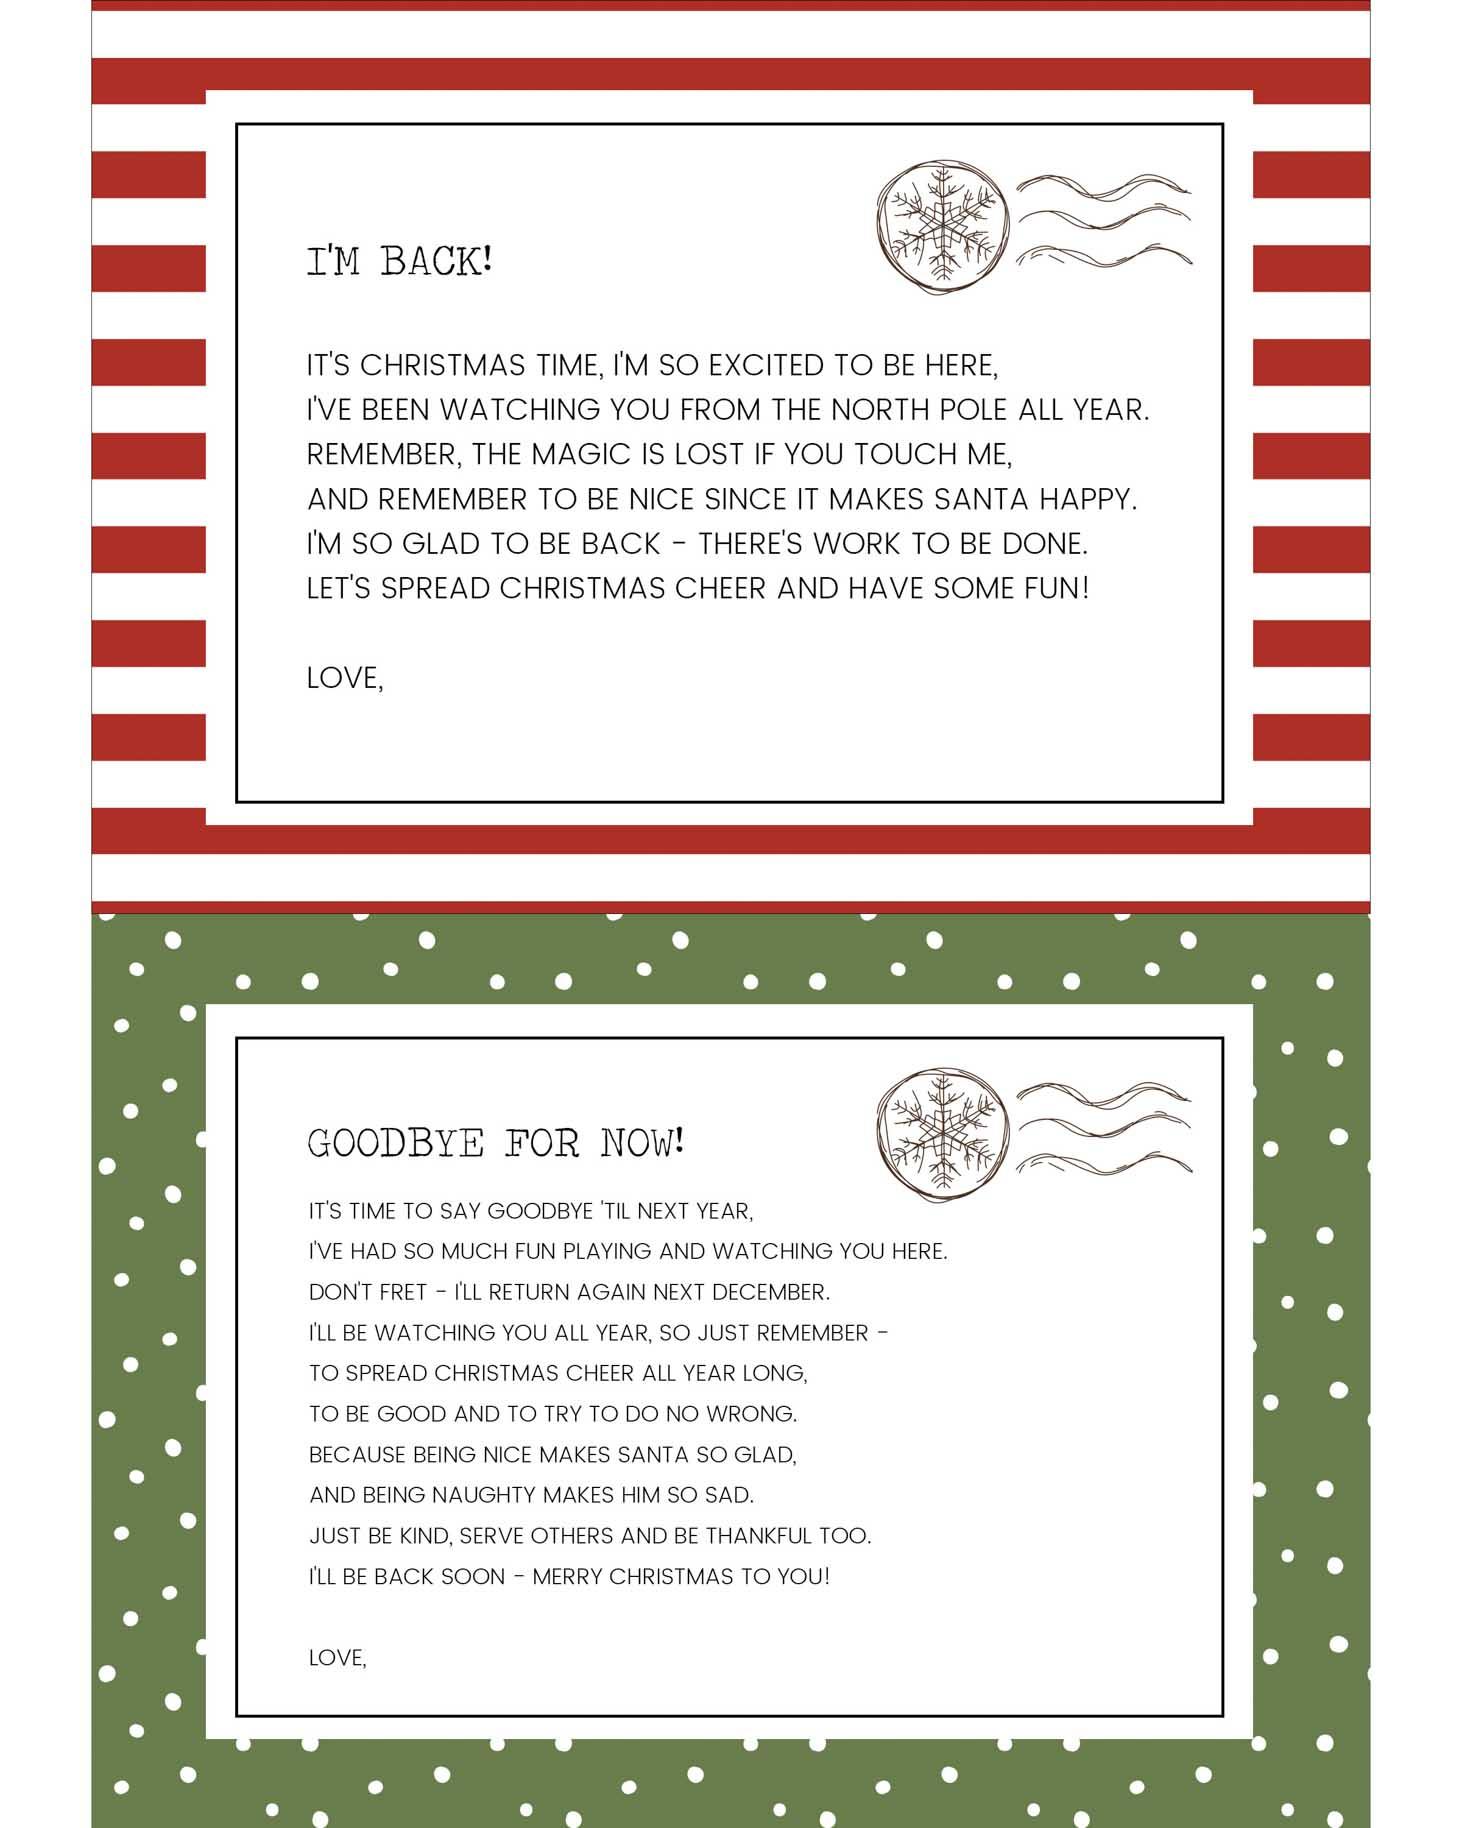 Funny Elf On The Shelf Ideas + Free Printables | Lil' Luna - Elf On The Shelf Goodbye Letter Free Printable